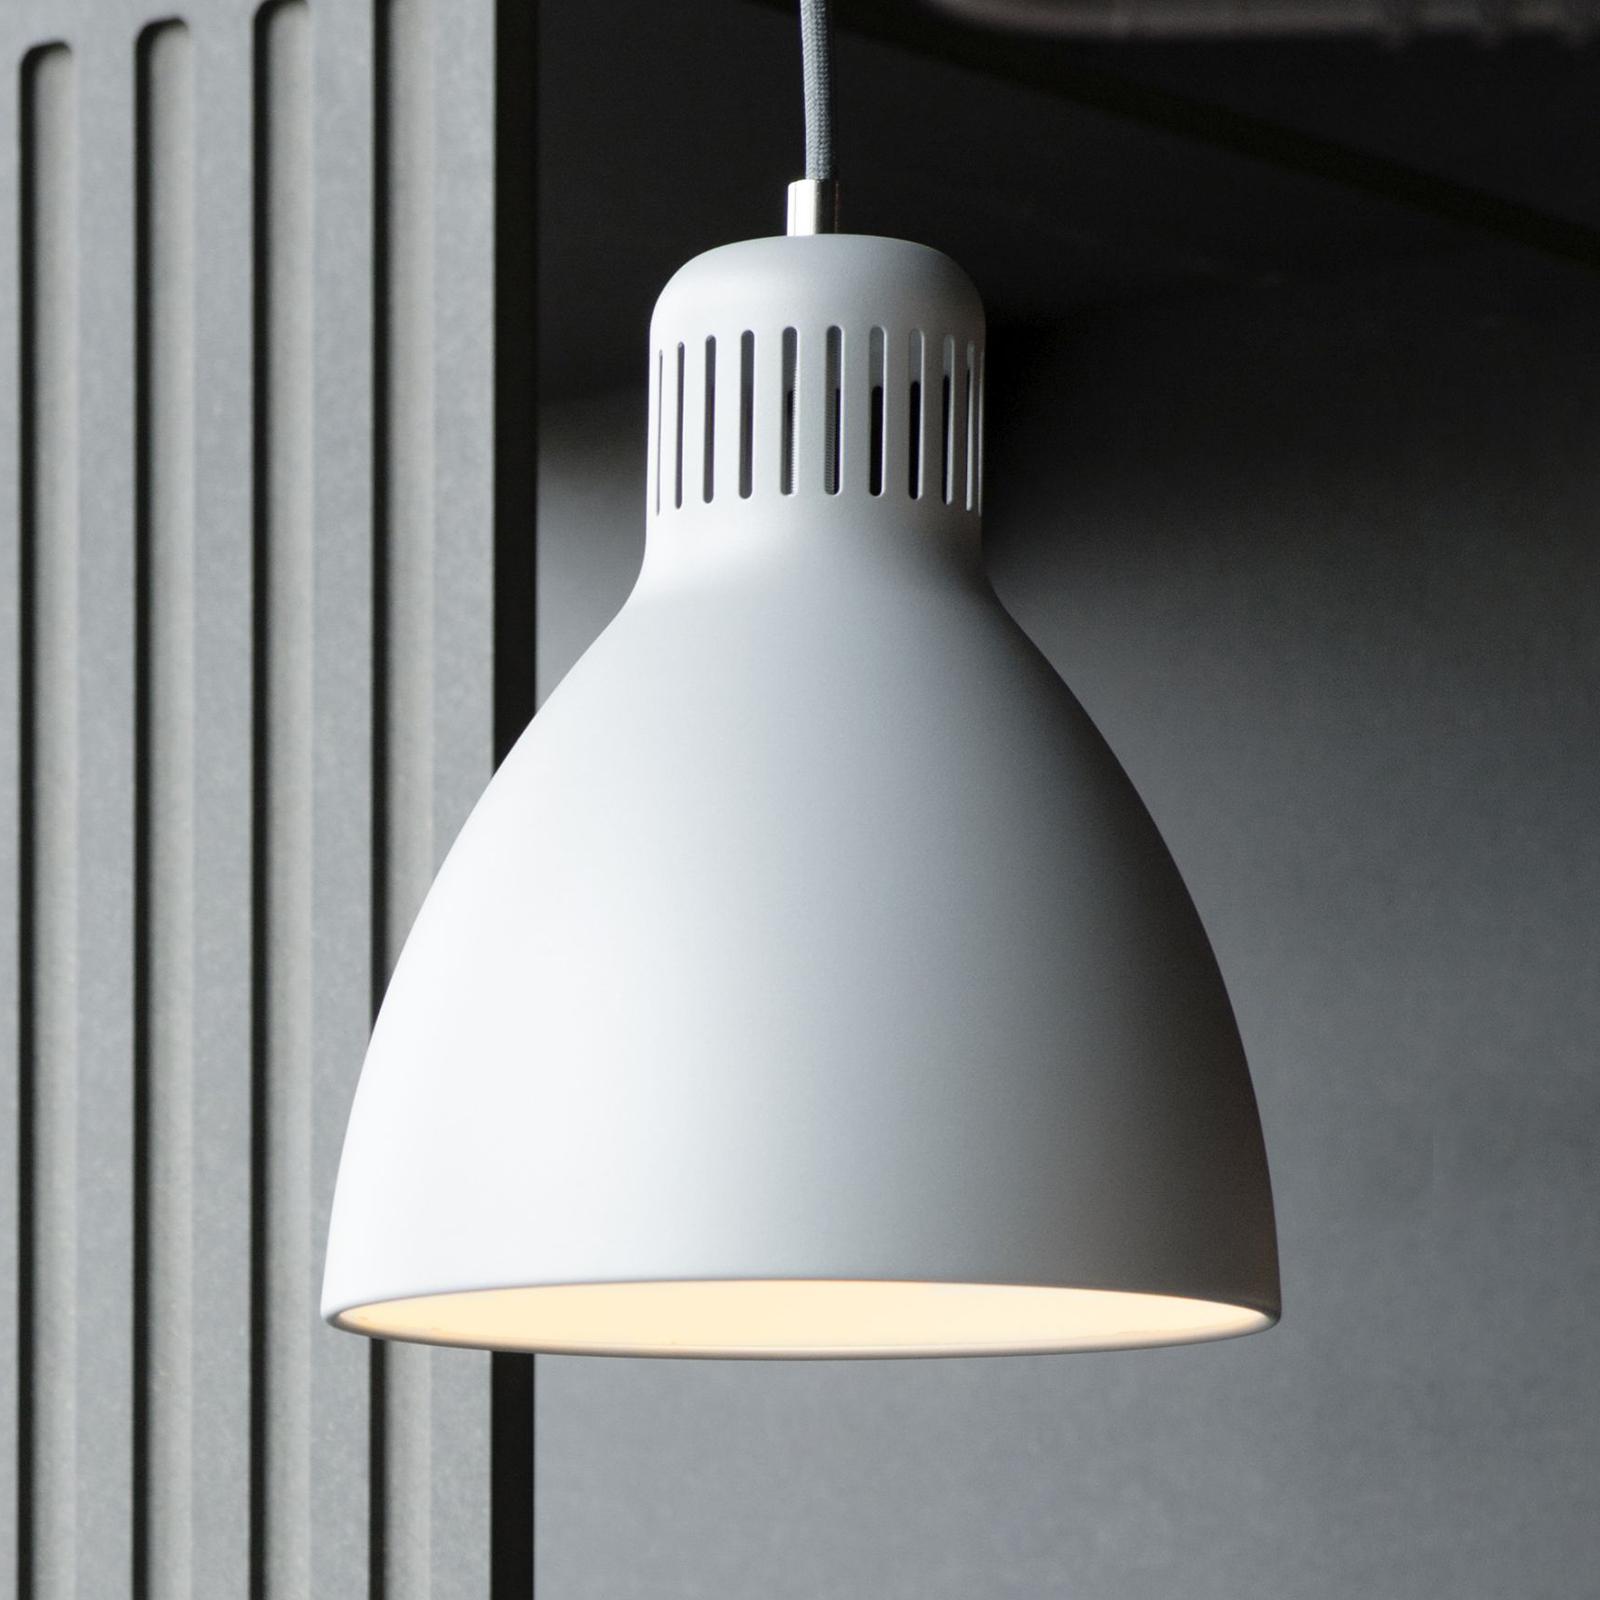 LED-riippuvalaisin L-1, 4 000 K, valkoinen